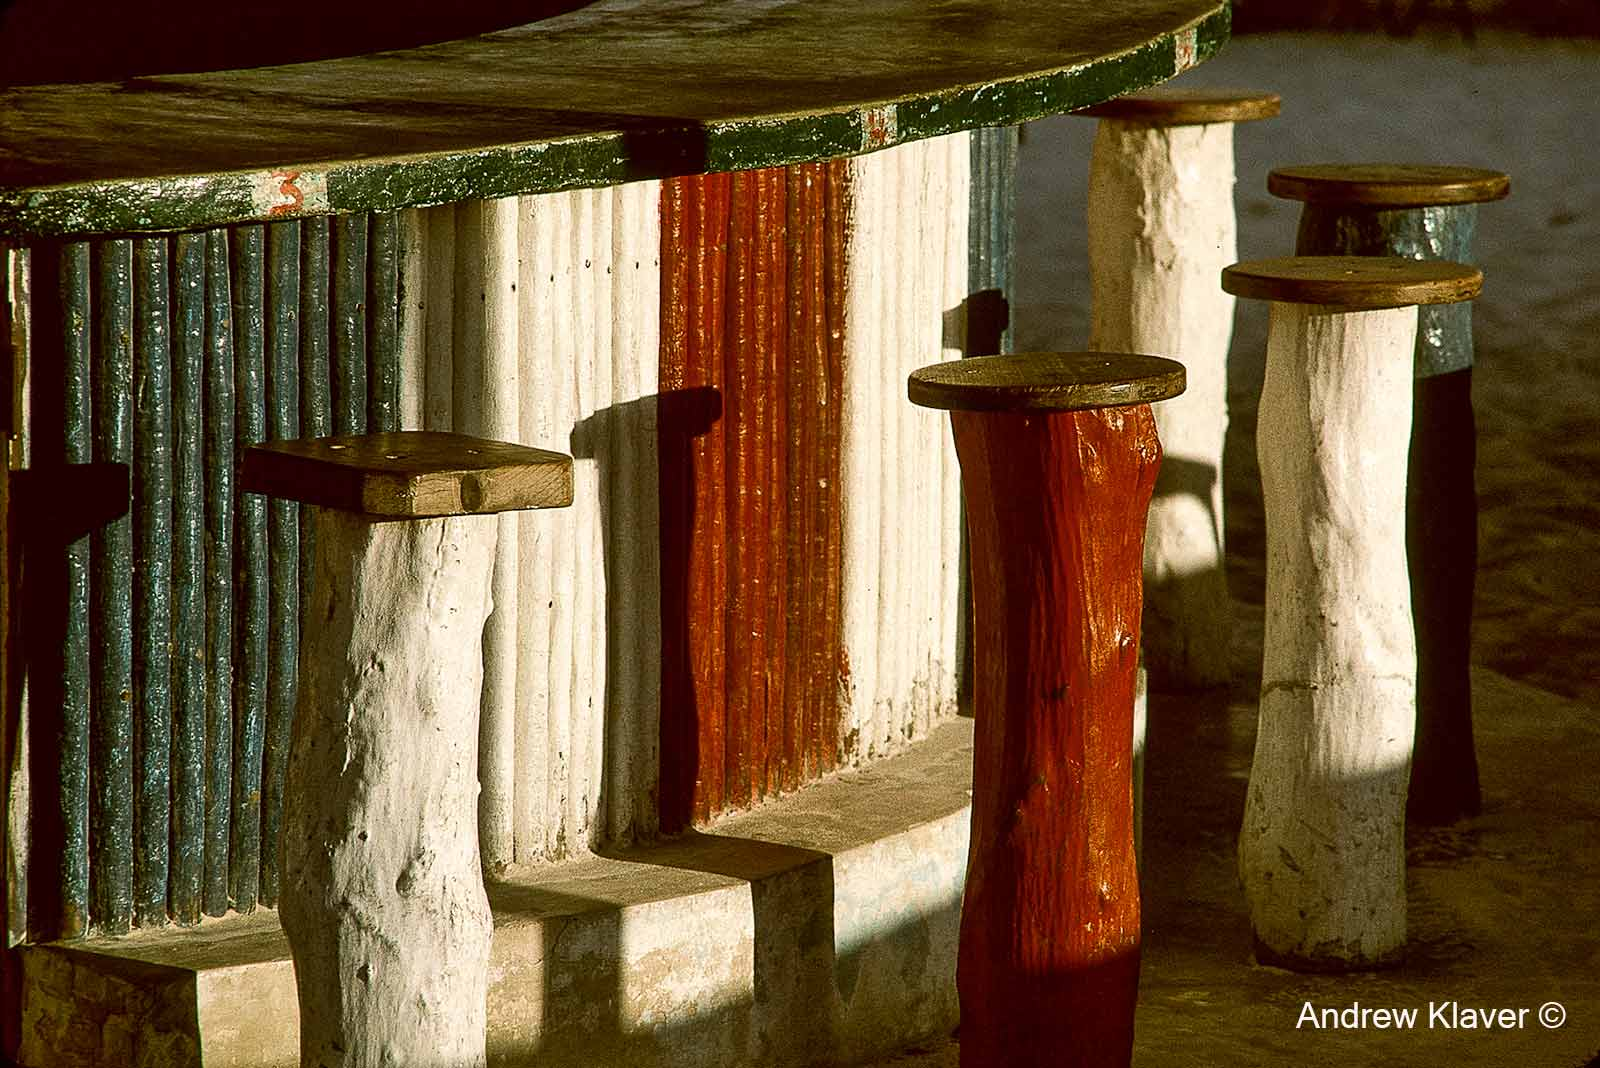 Playa del Carmen, bar stools, 1989